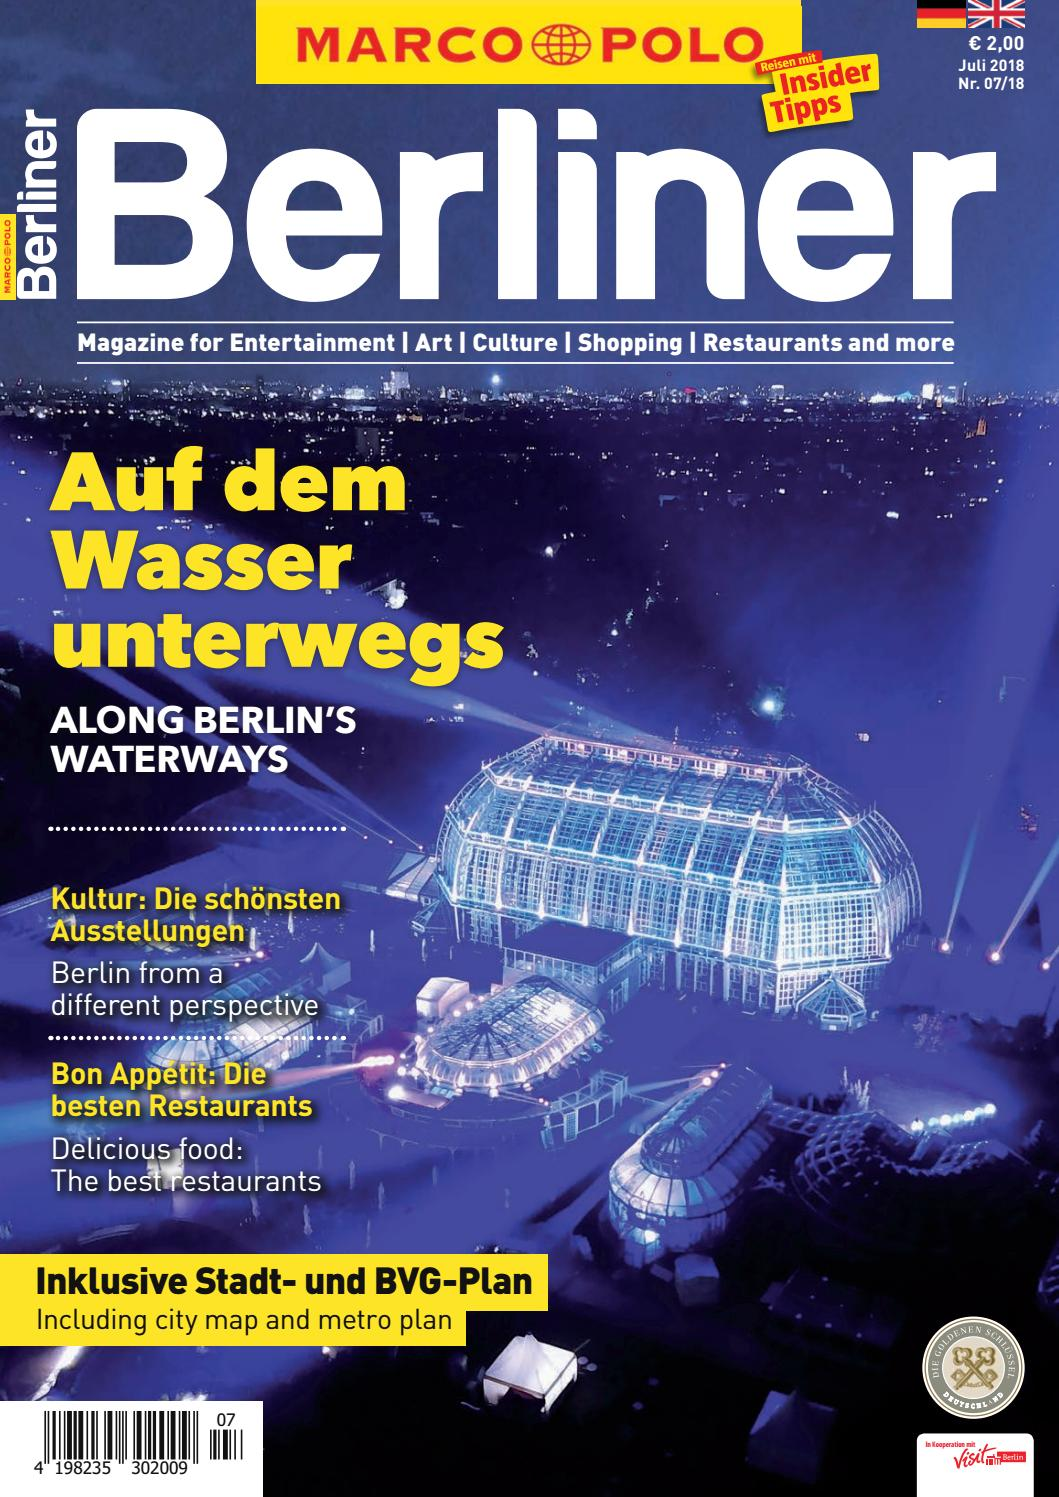 Marco Polo Berliner #072018 by Berlin Medien GmbH issuu